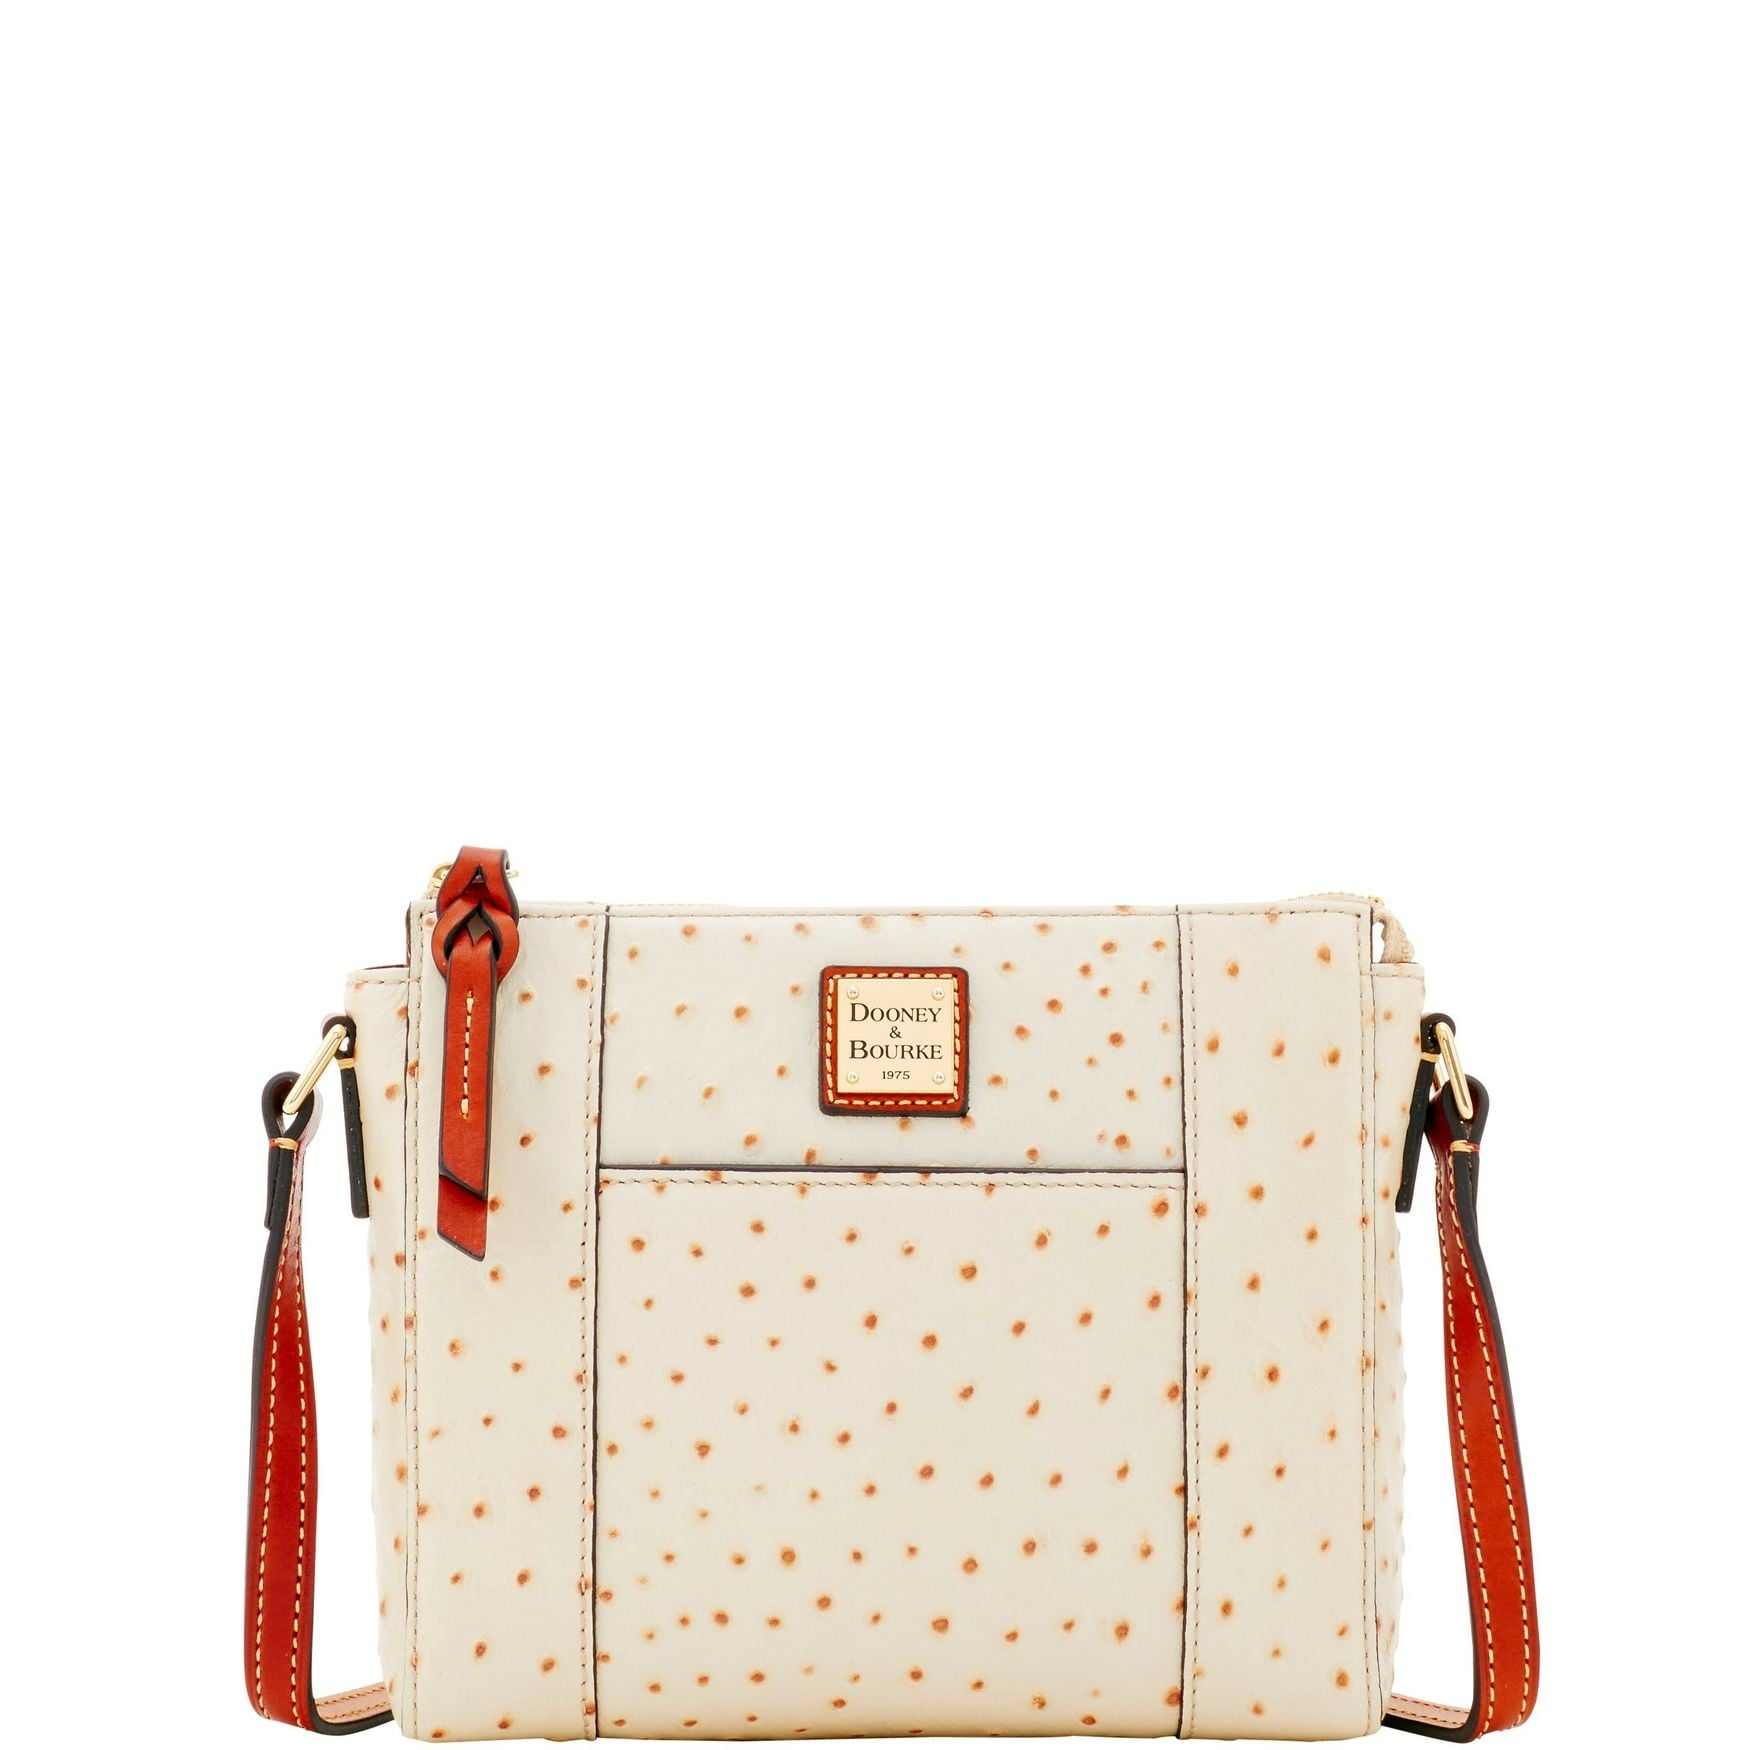 7b6a788d4f2 Designer Handbags | Shop Online at Overstock